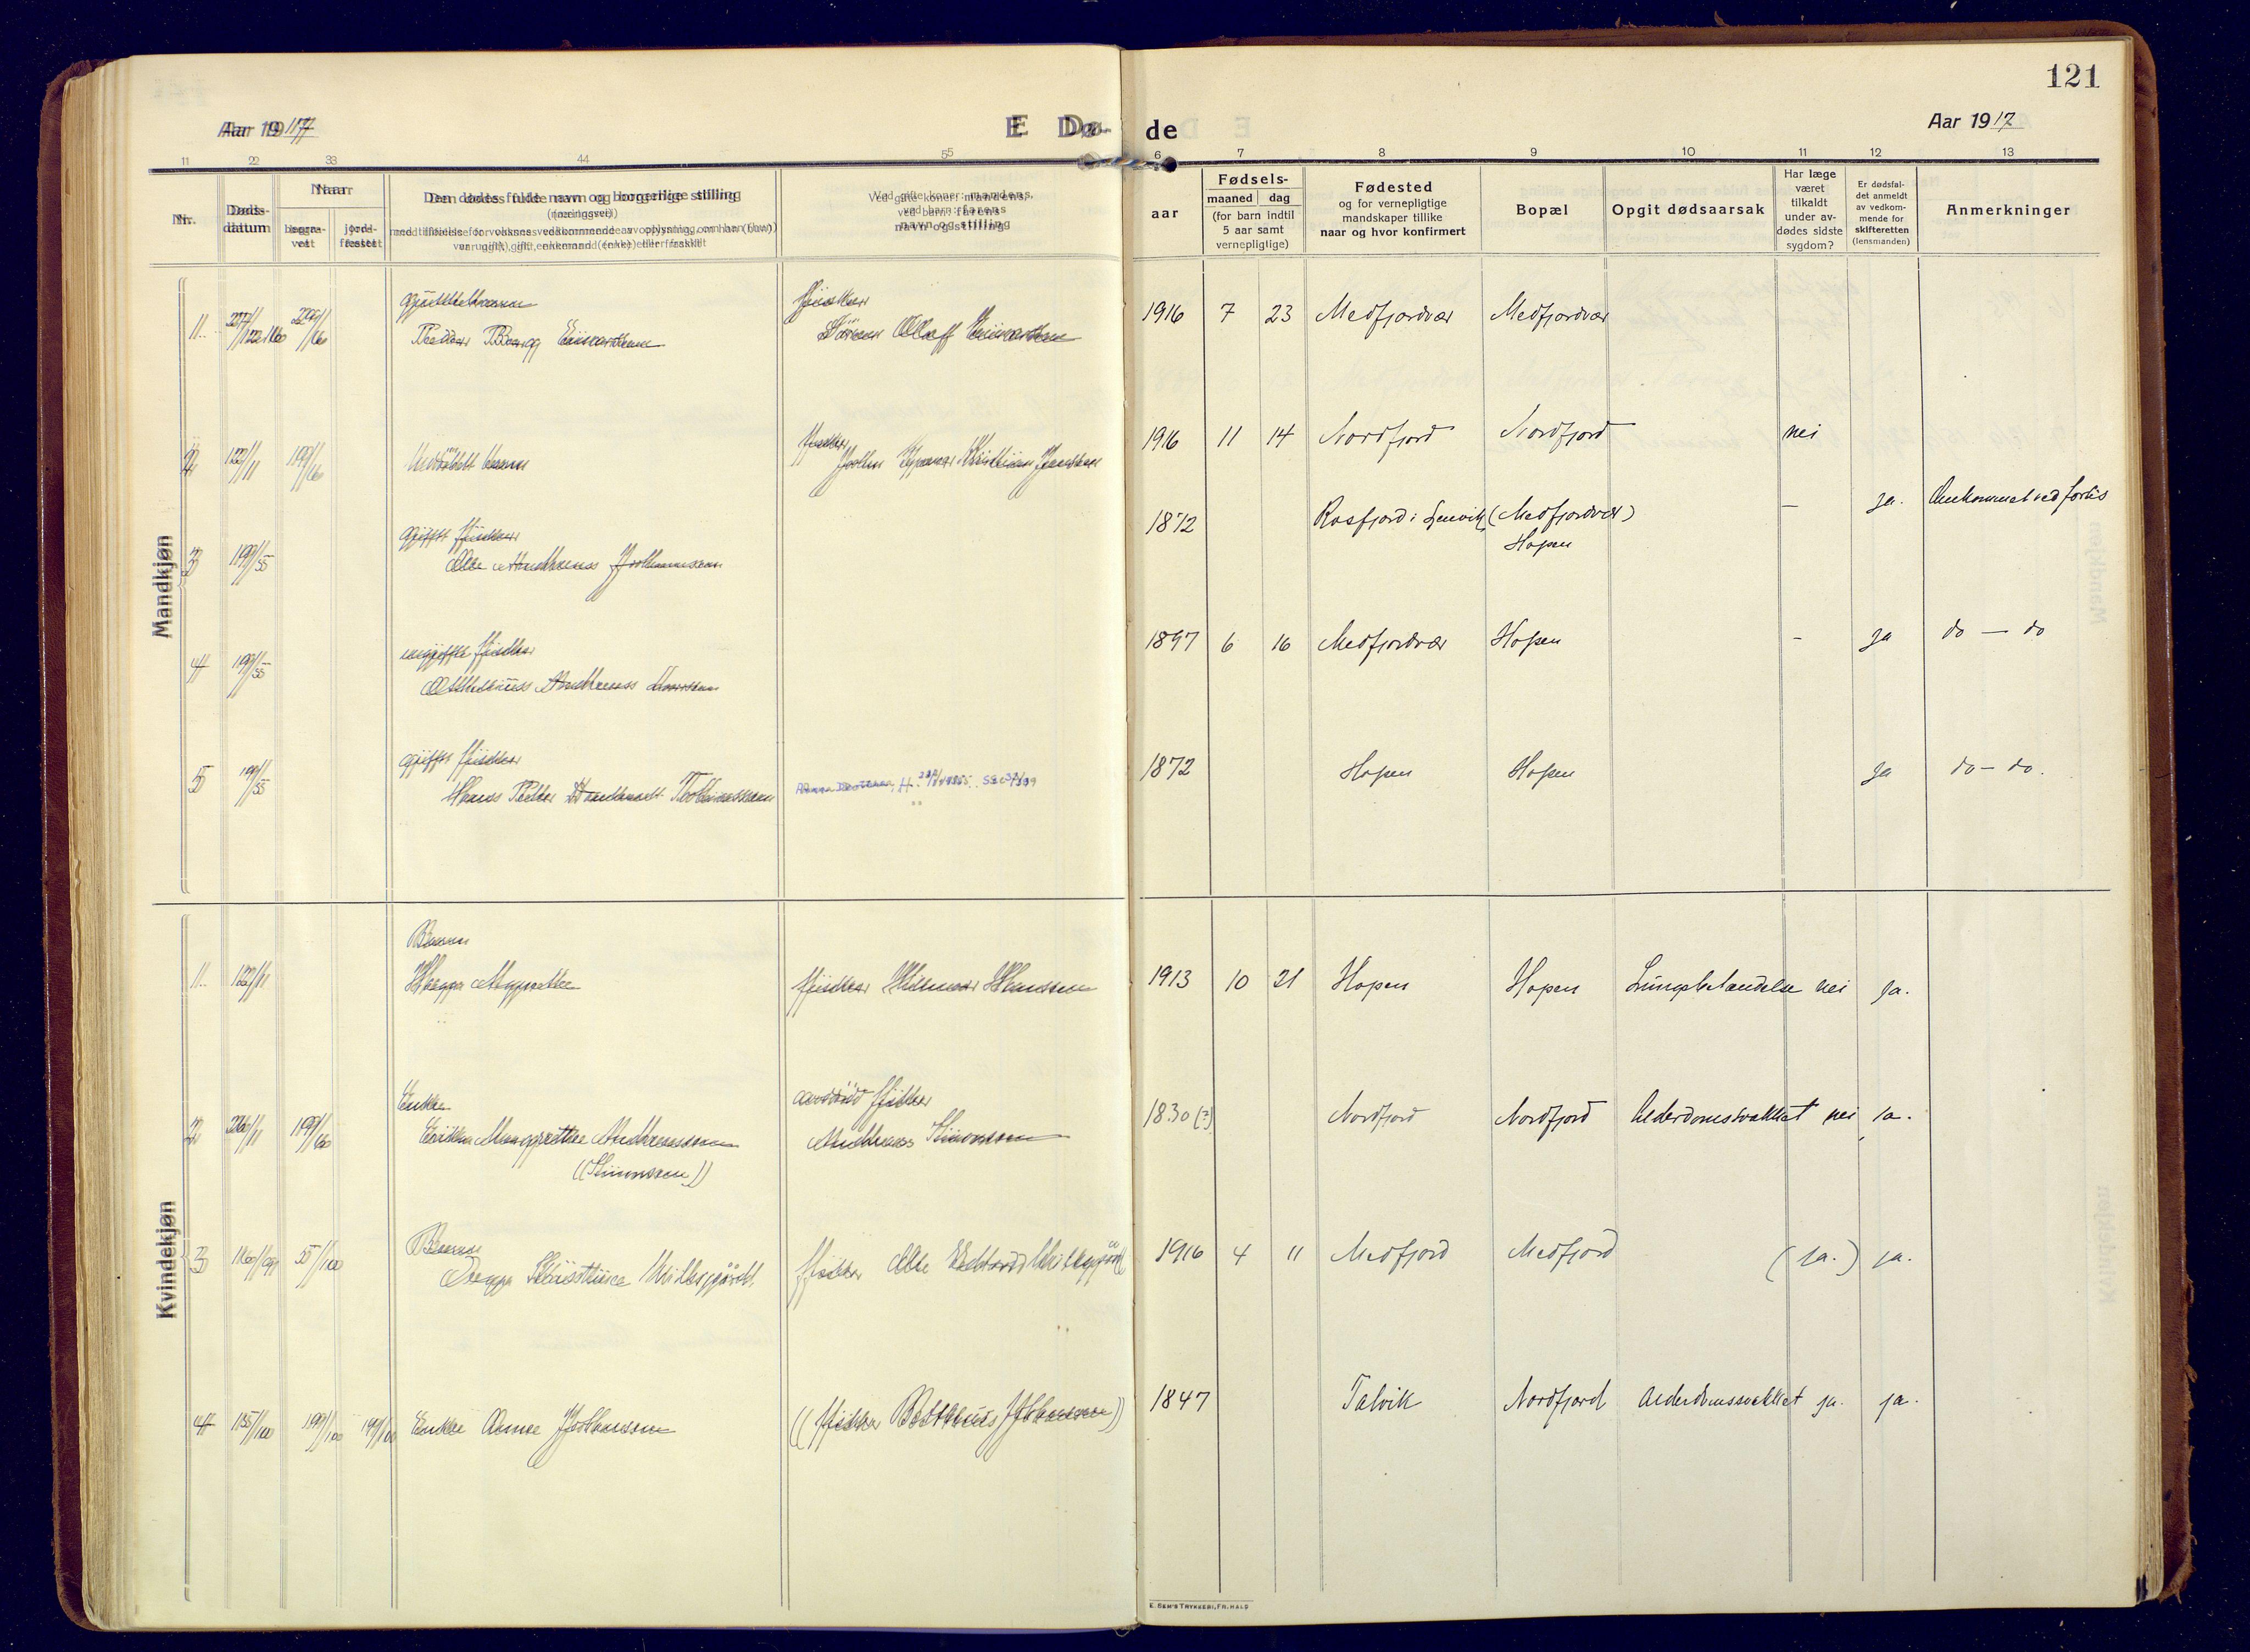 SATØ, Mefjord/Berg sokneprestkontor, G/Ga/Gaa: Ministerialbok nr. 9, 1916-1928, s. 121